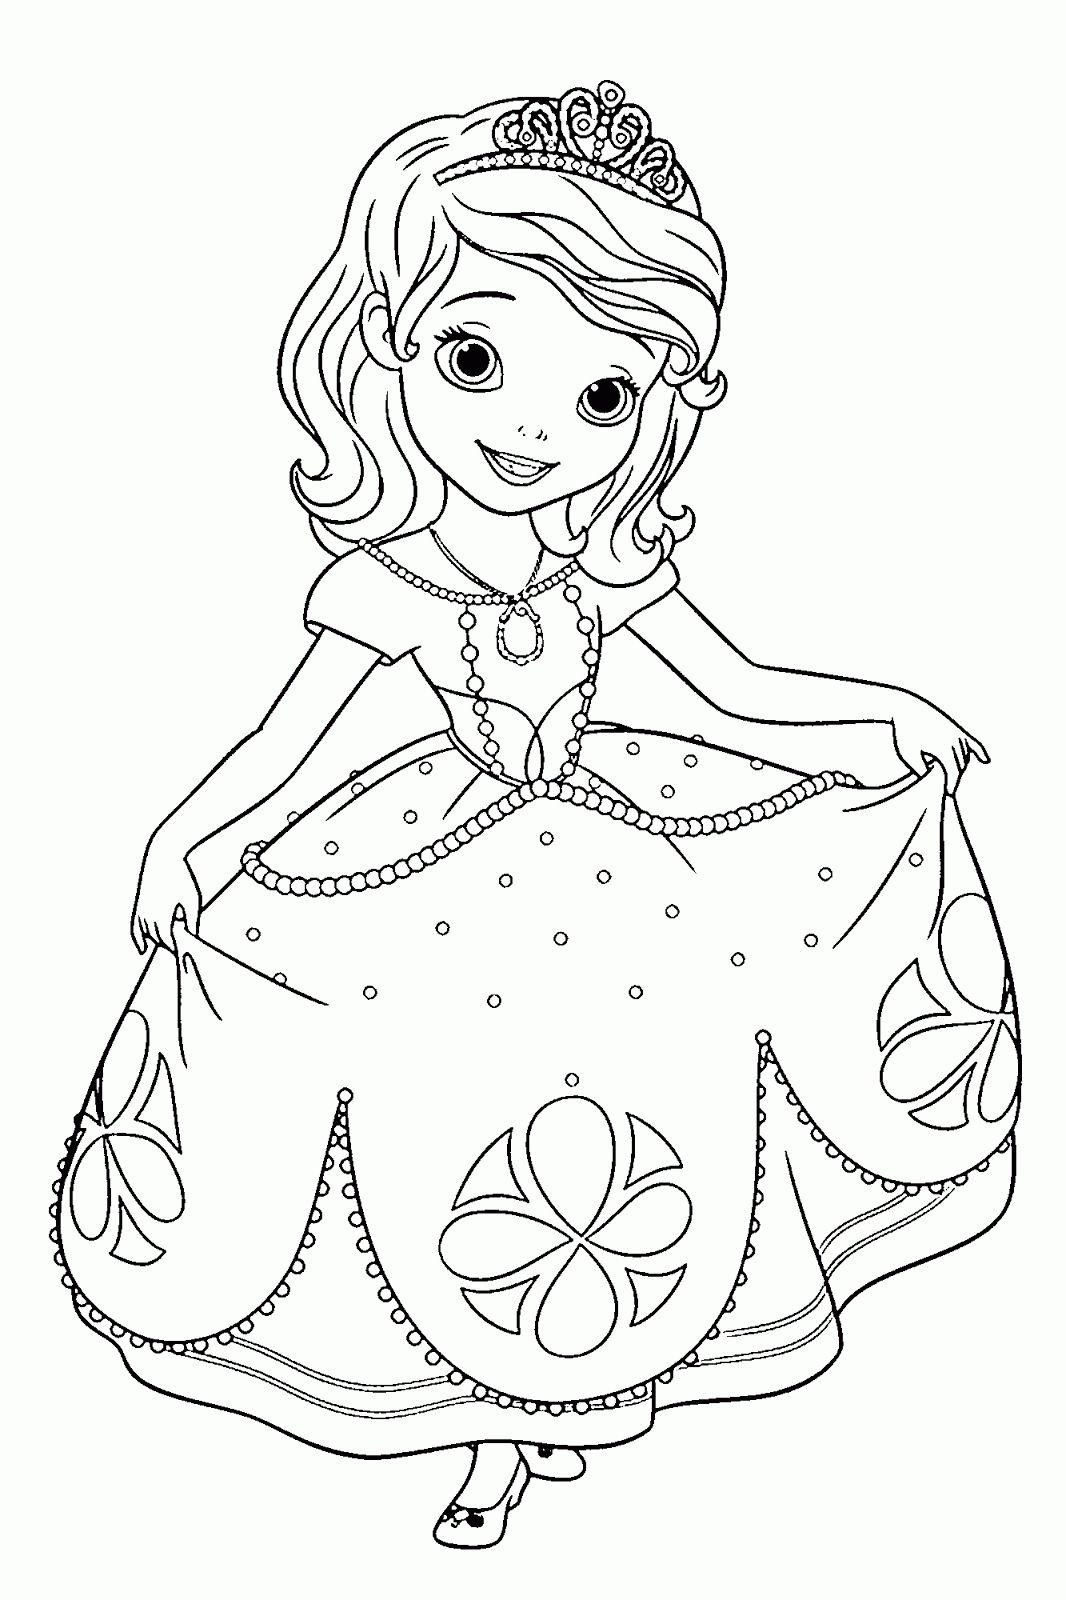 Dibujos de La Princesa Sofia para colorear, dibujos disney | Para